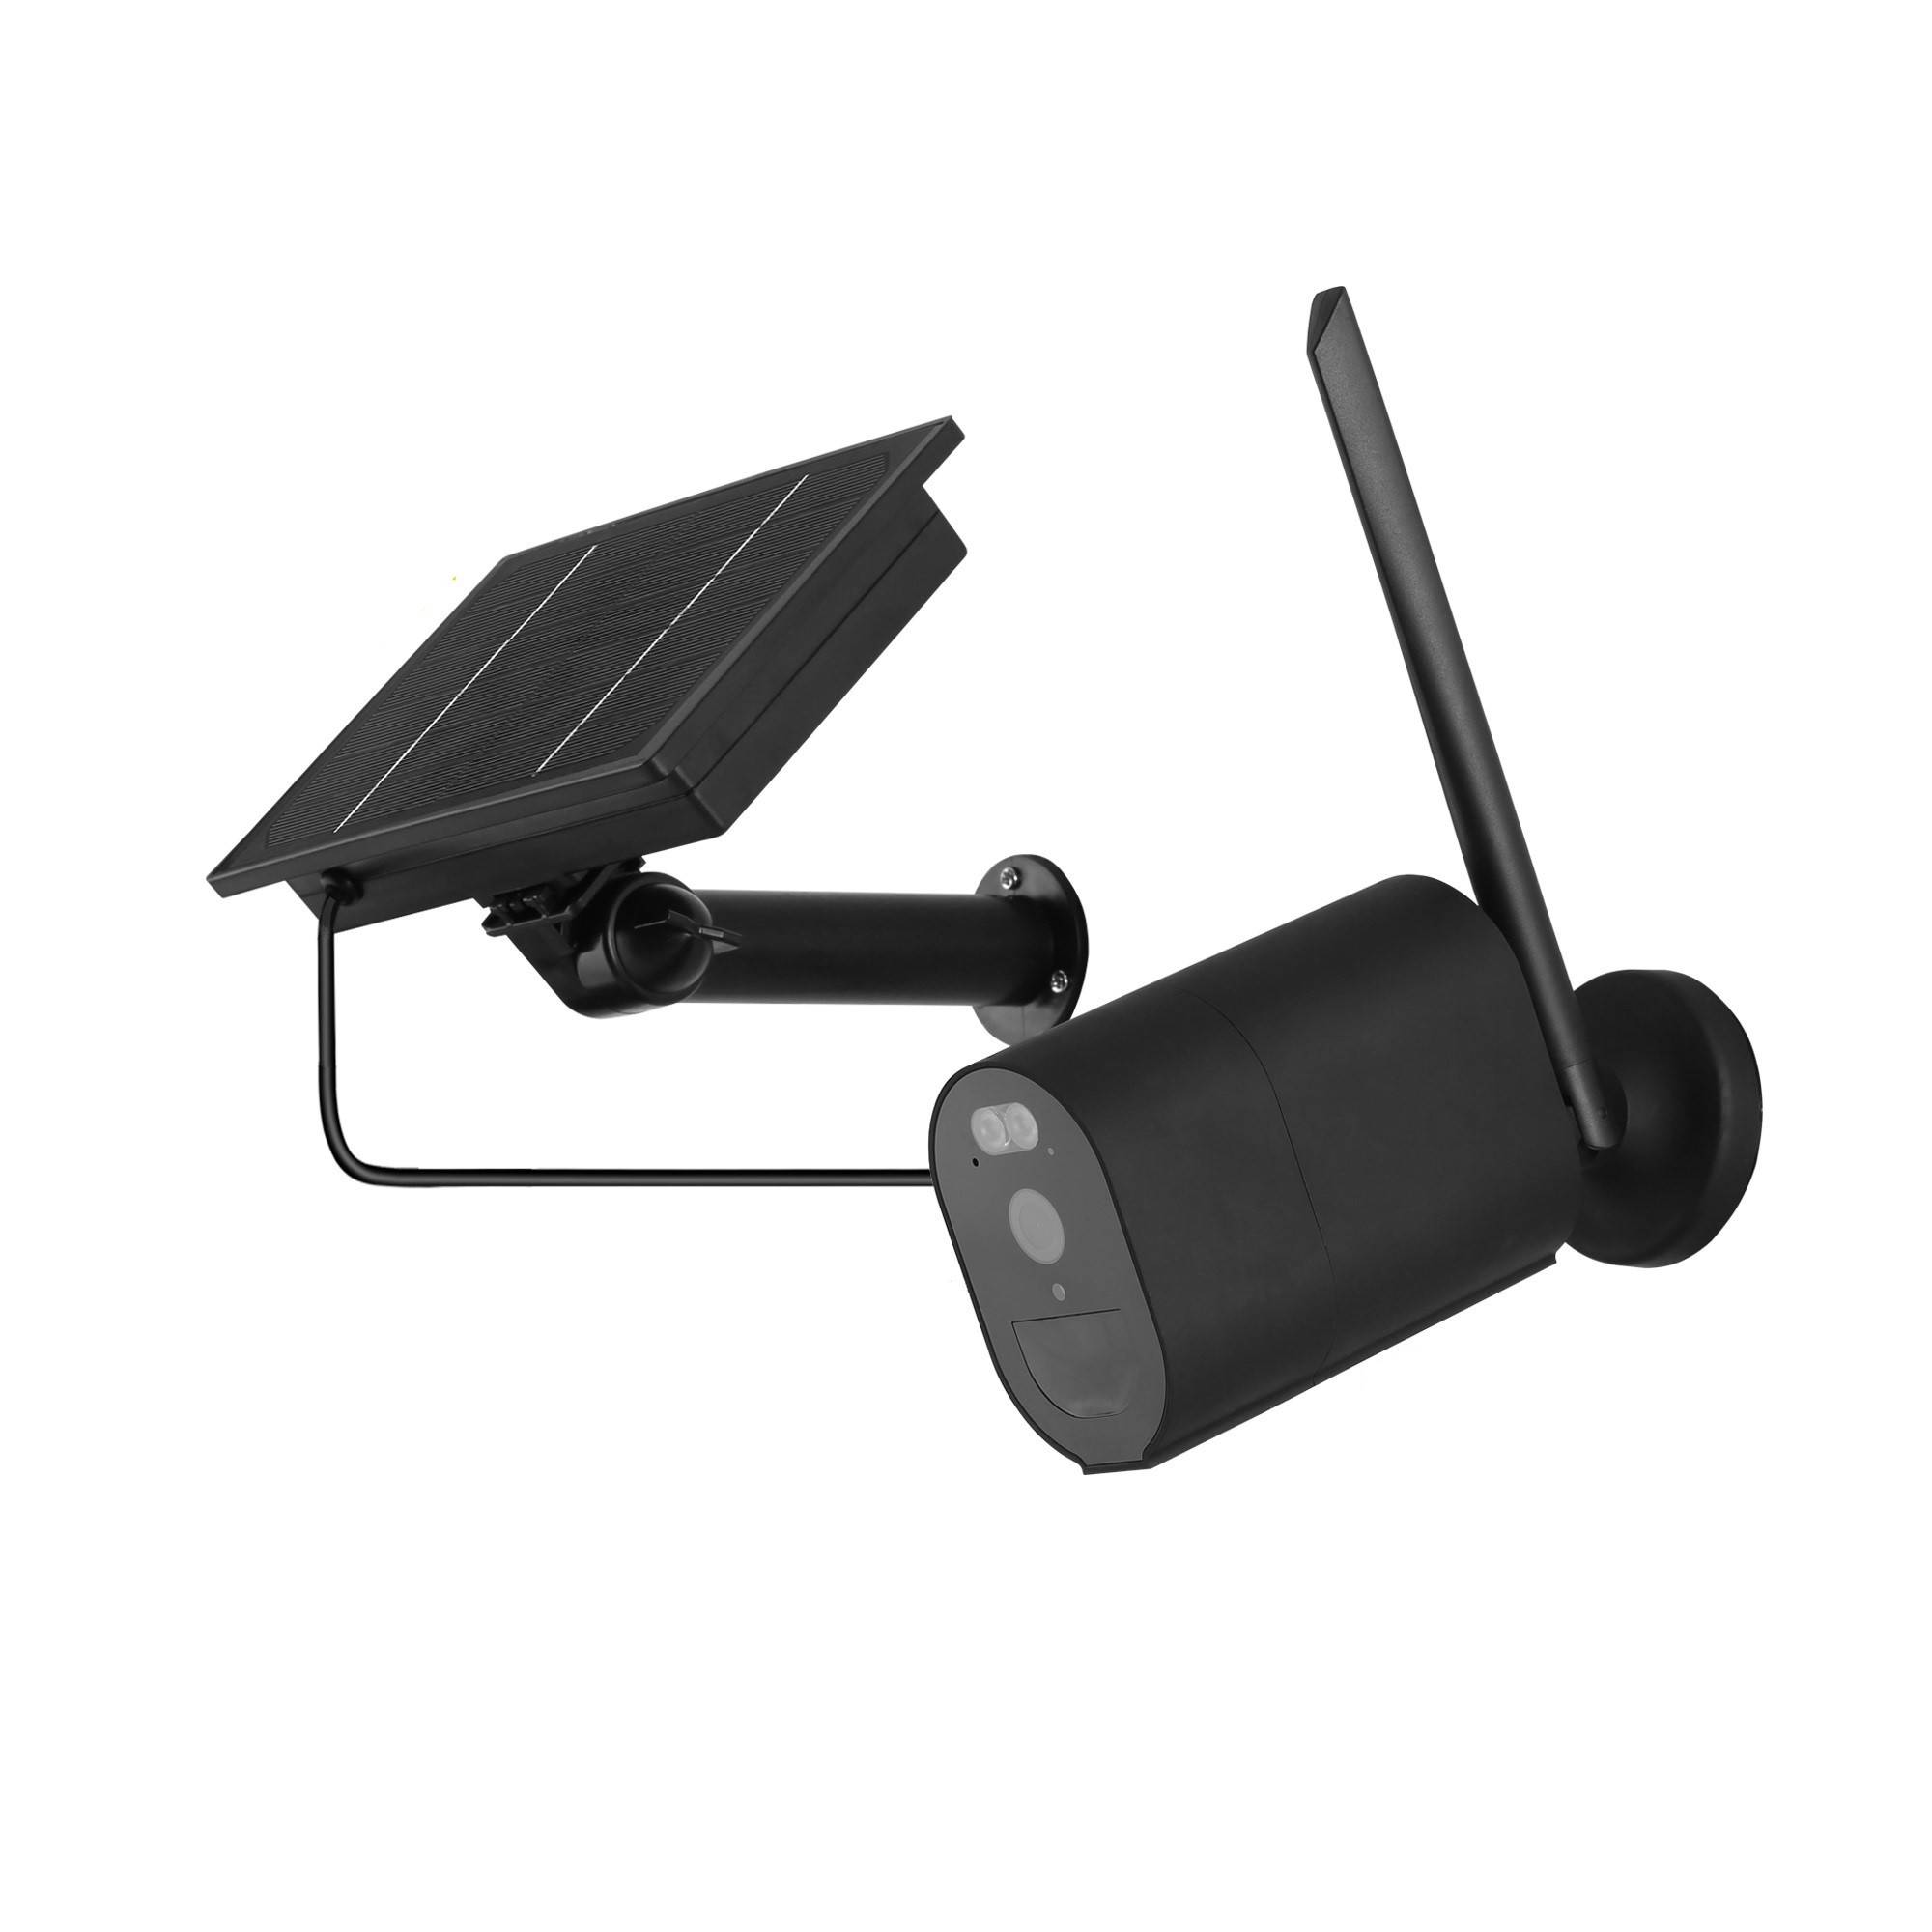 Smart Wi-Fi Camera